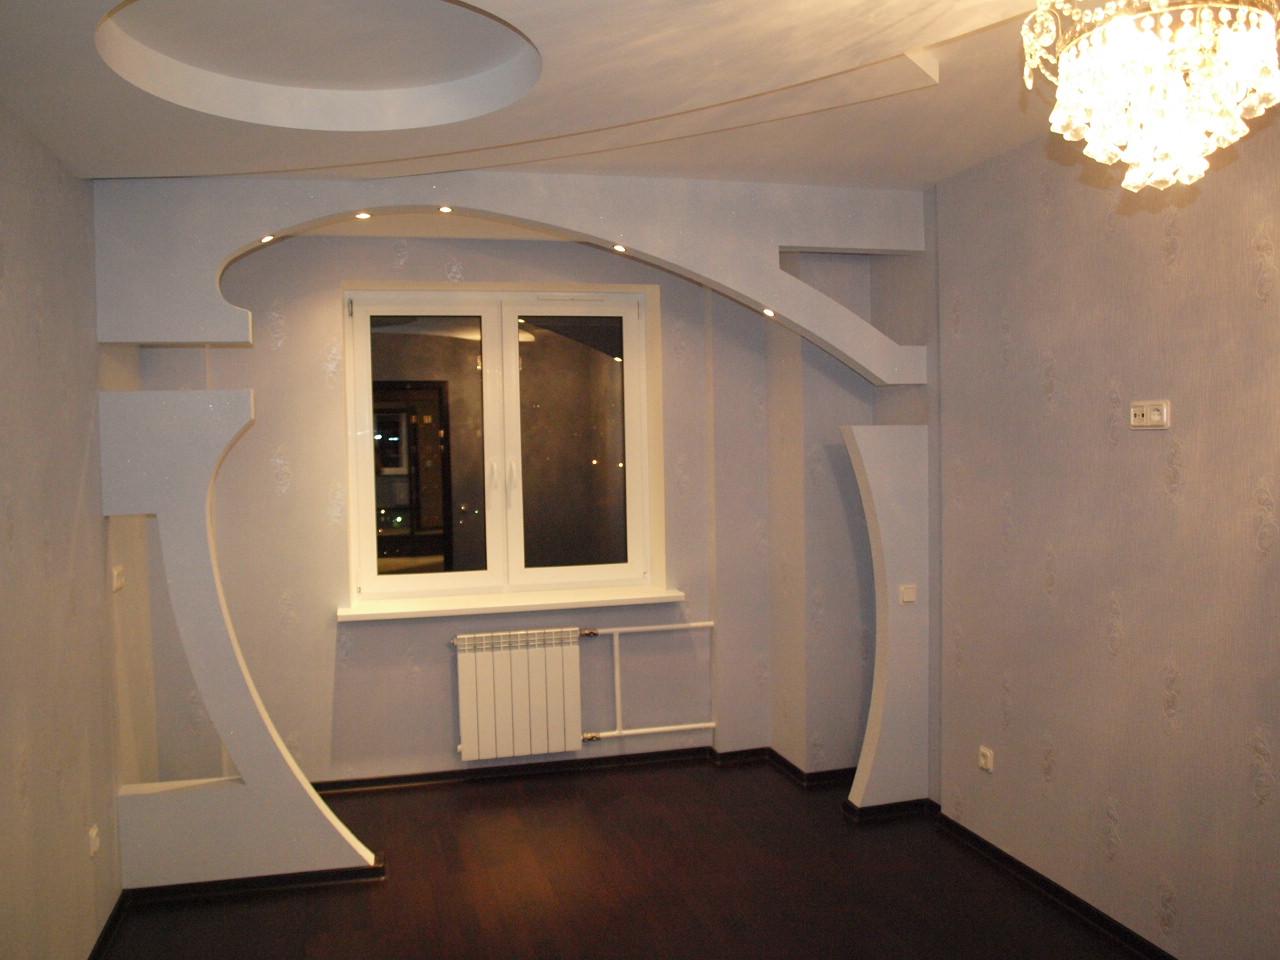 top interioare scafe rigips images for pinterest tattoos. Black Bedroom Furniture Sets. Home Design Ideas